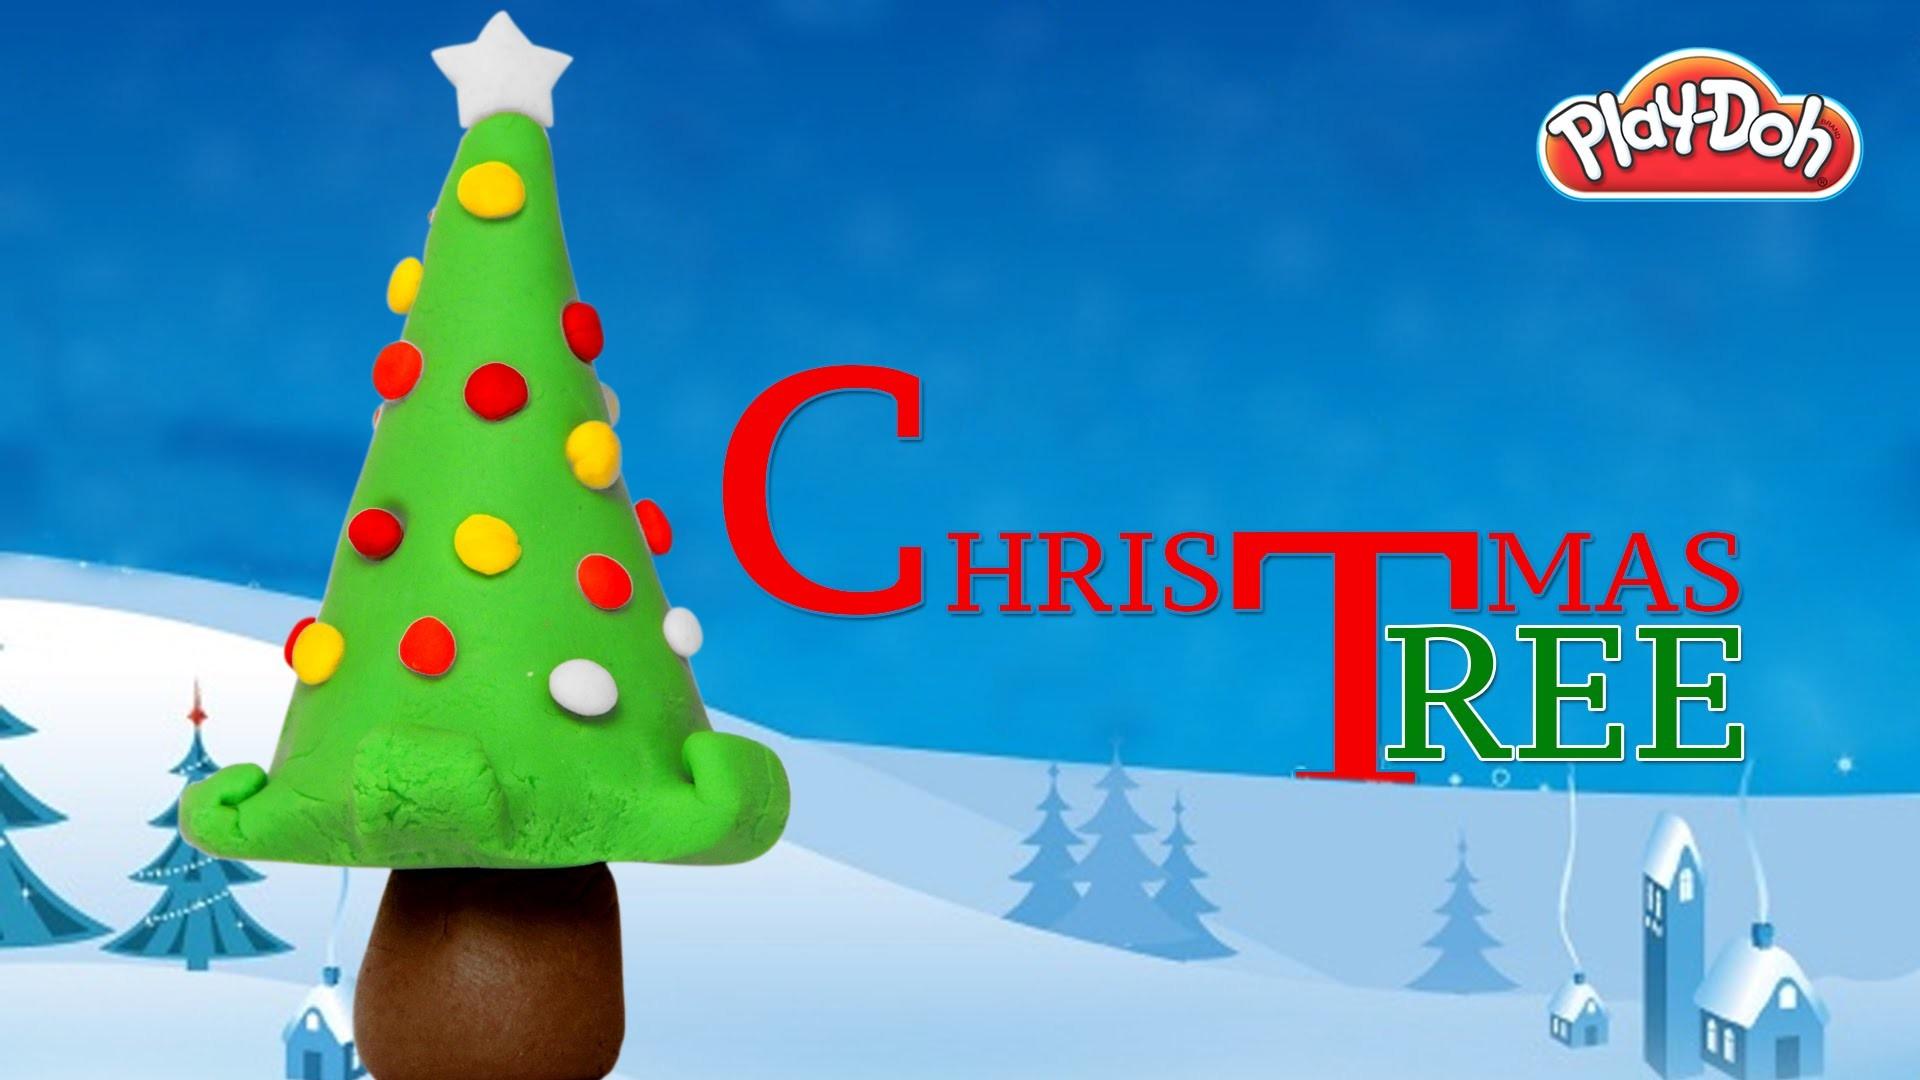 Play Doh Christmas Tree | Christmas Tree | How To Make Play Doh Christmas Tree